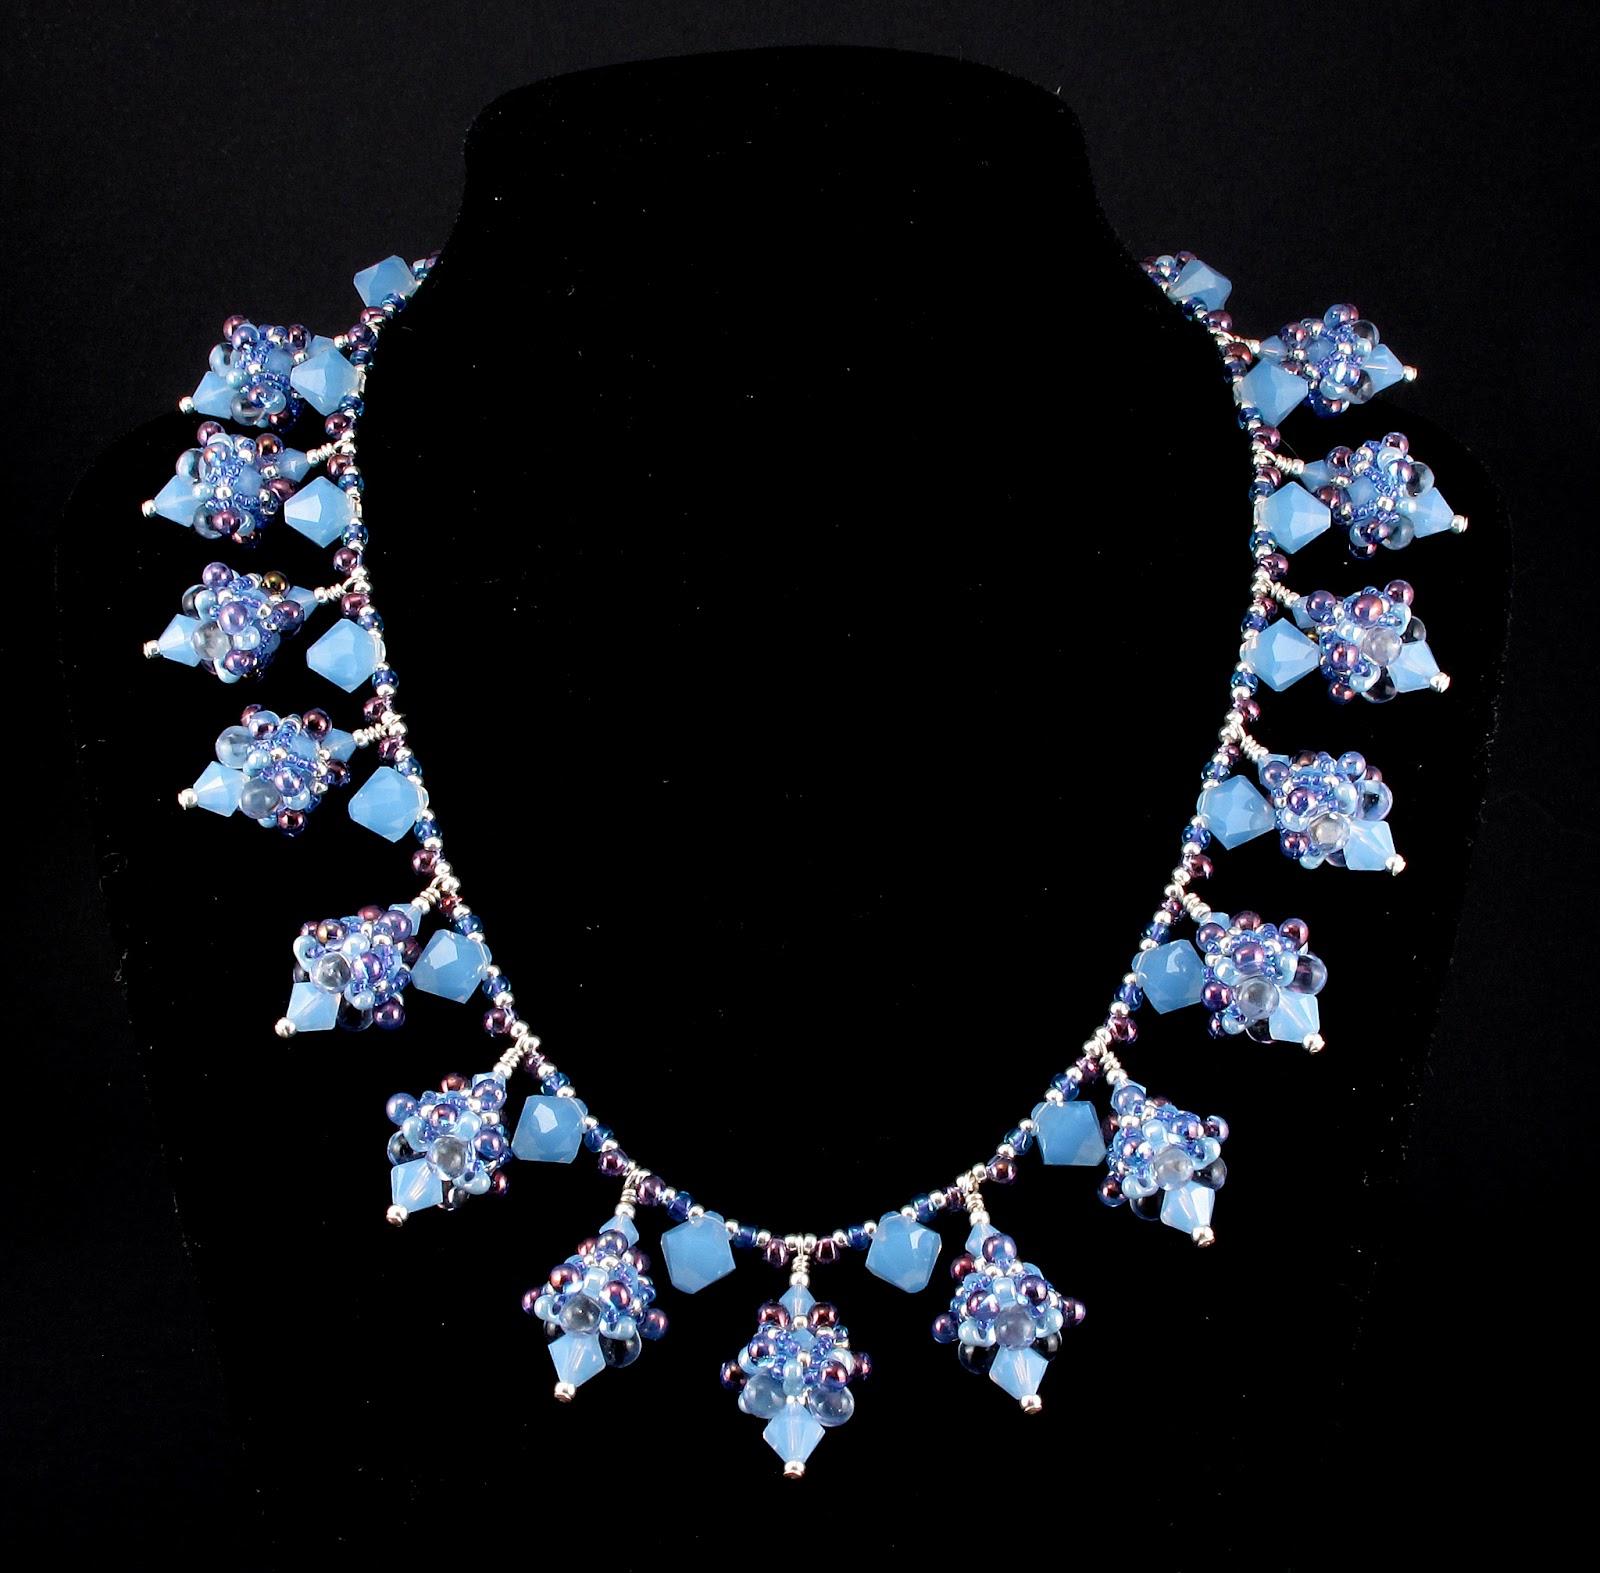 Bead Origami Ice Queen Necklace